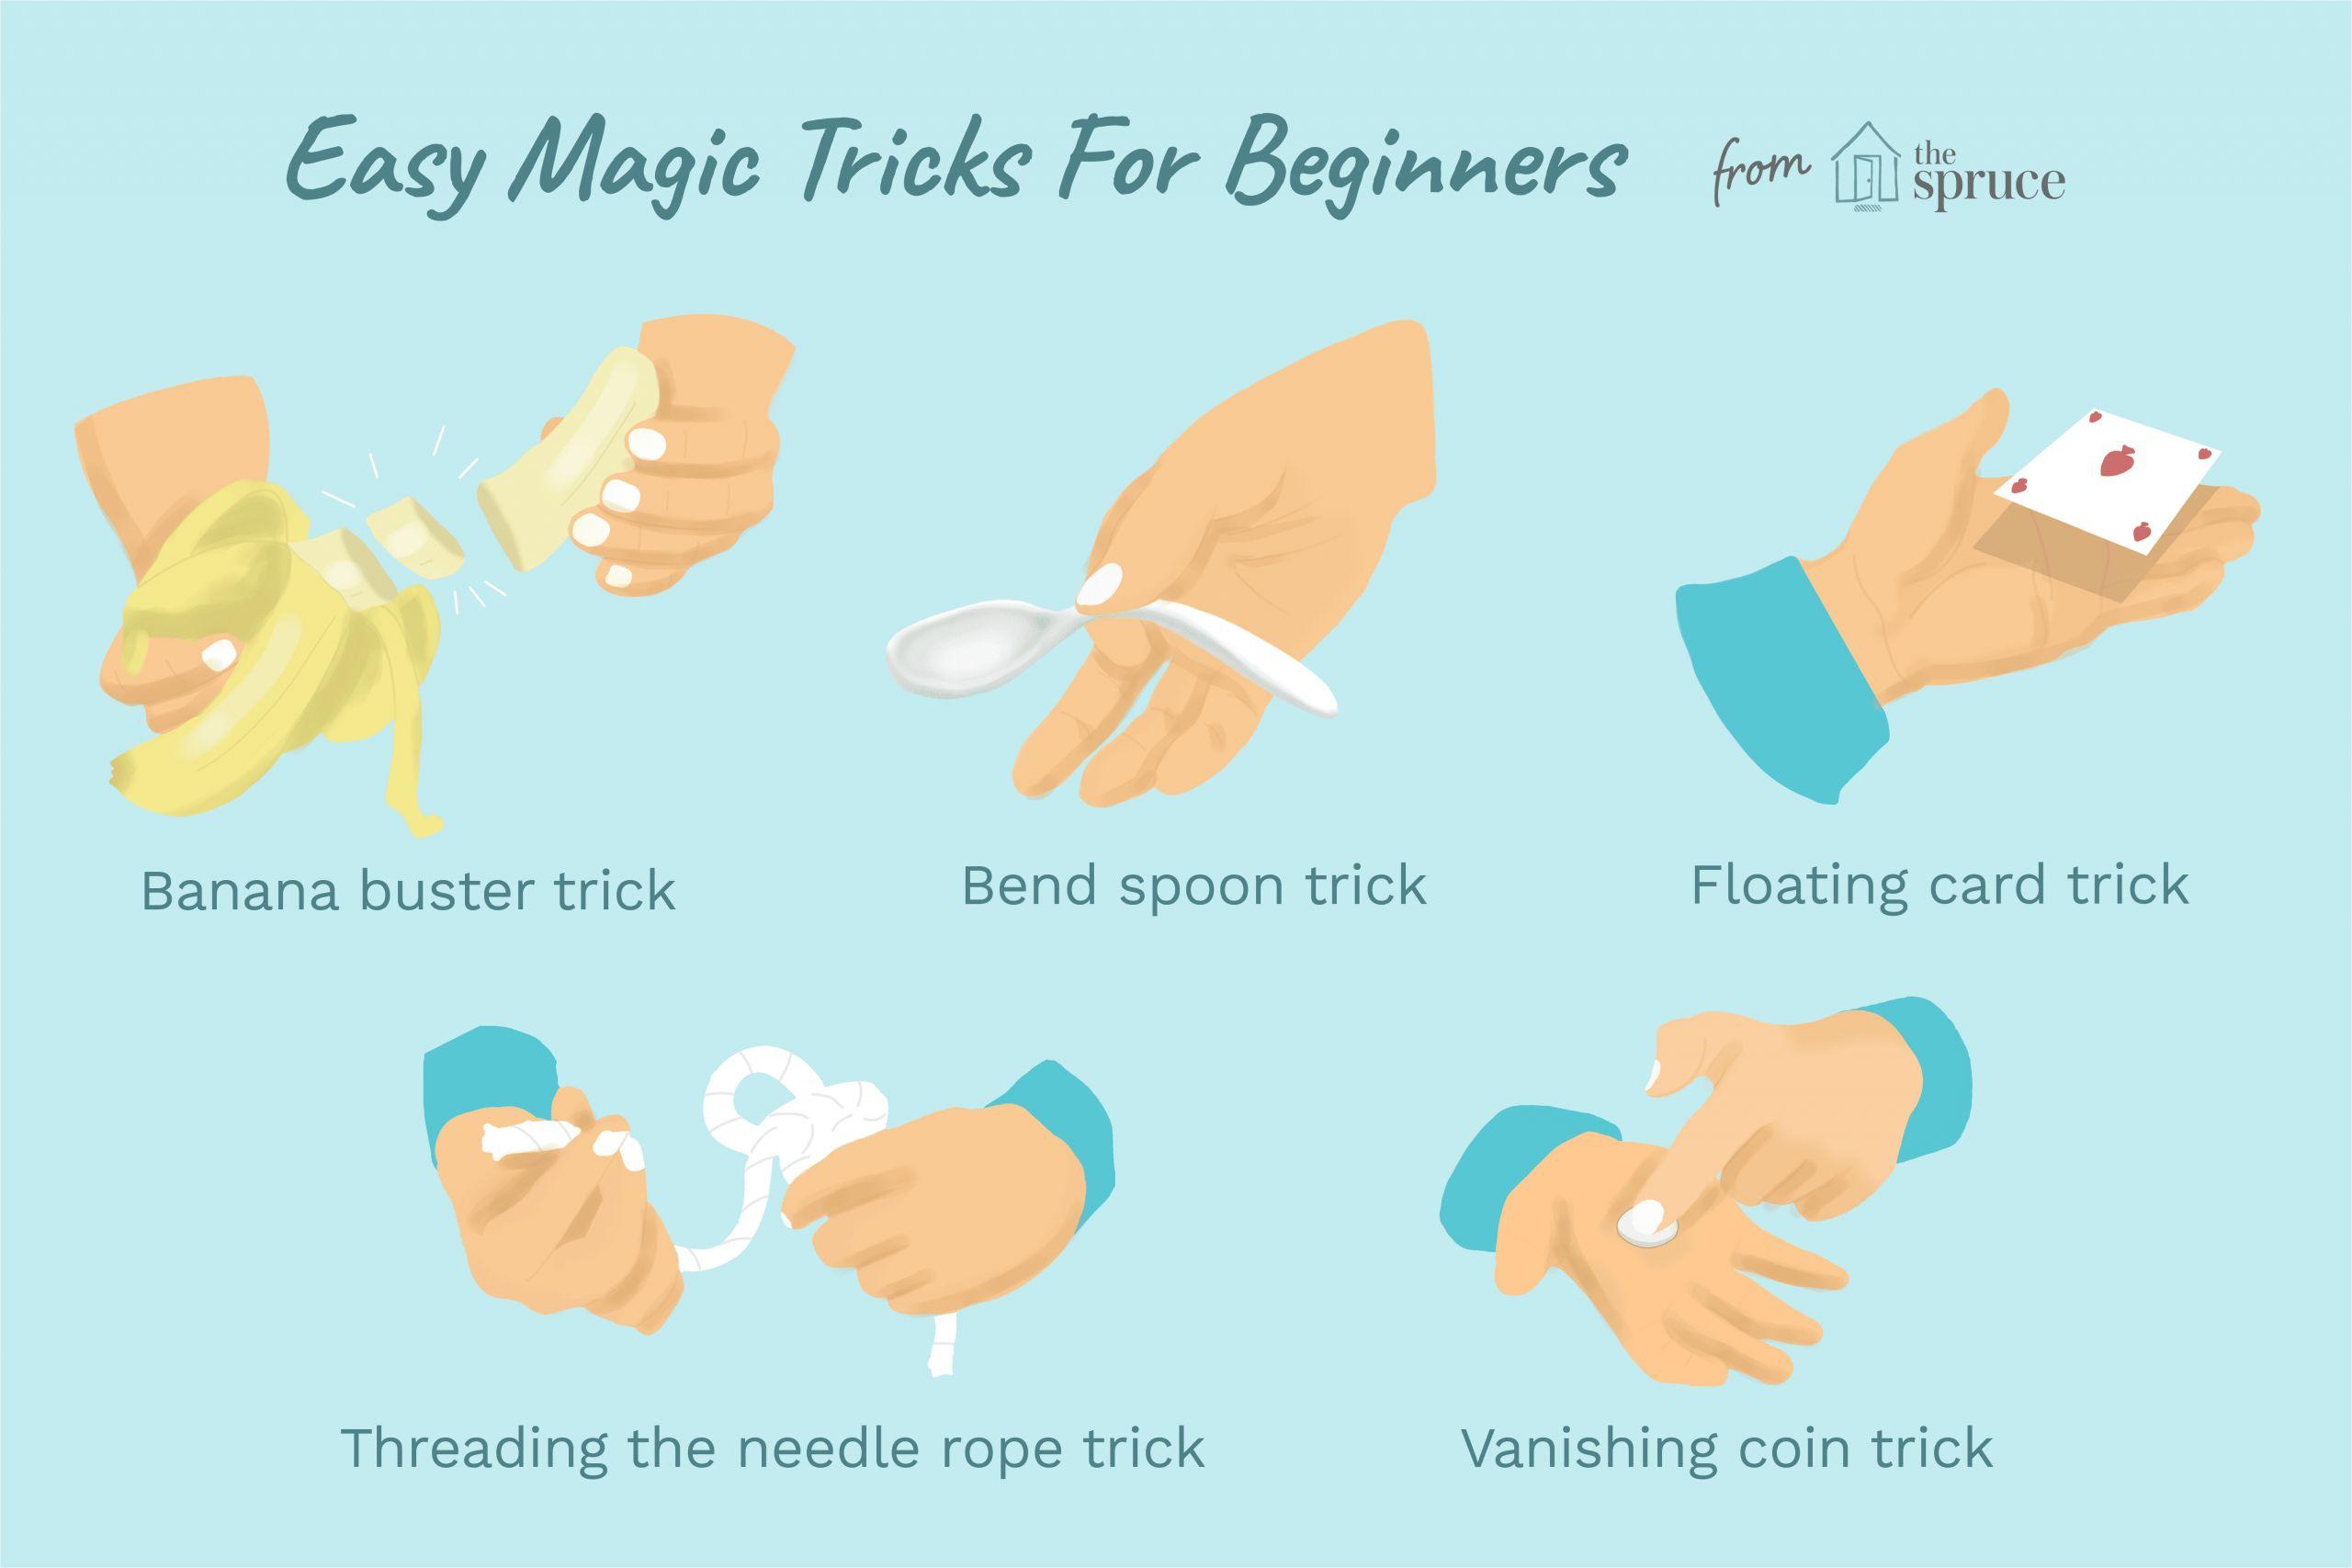 Easy Kid Card Magic Tricks Easy Magic Tricks for Kids and Beginners